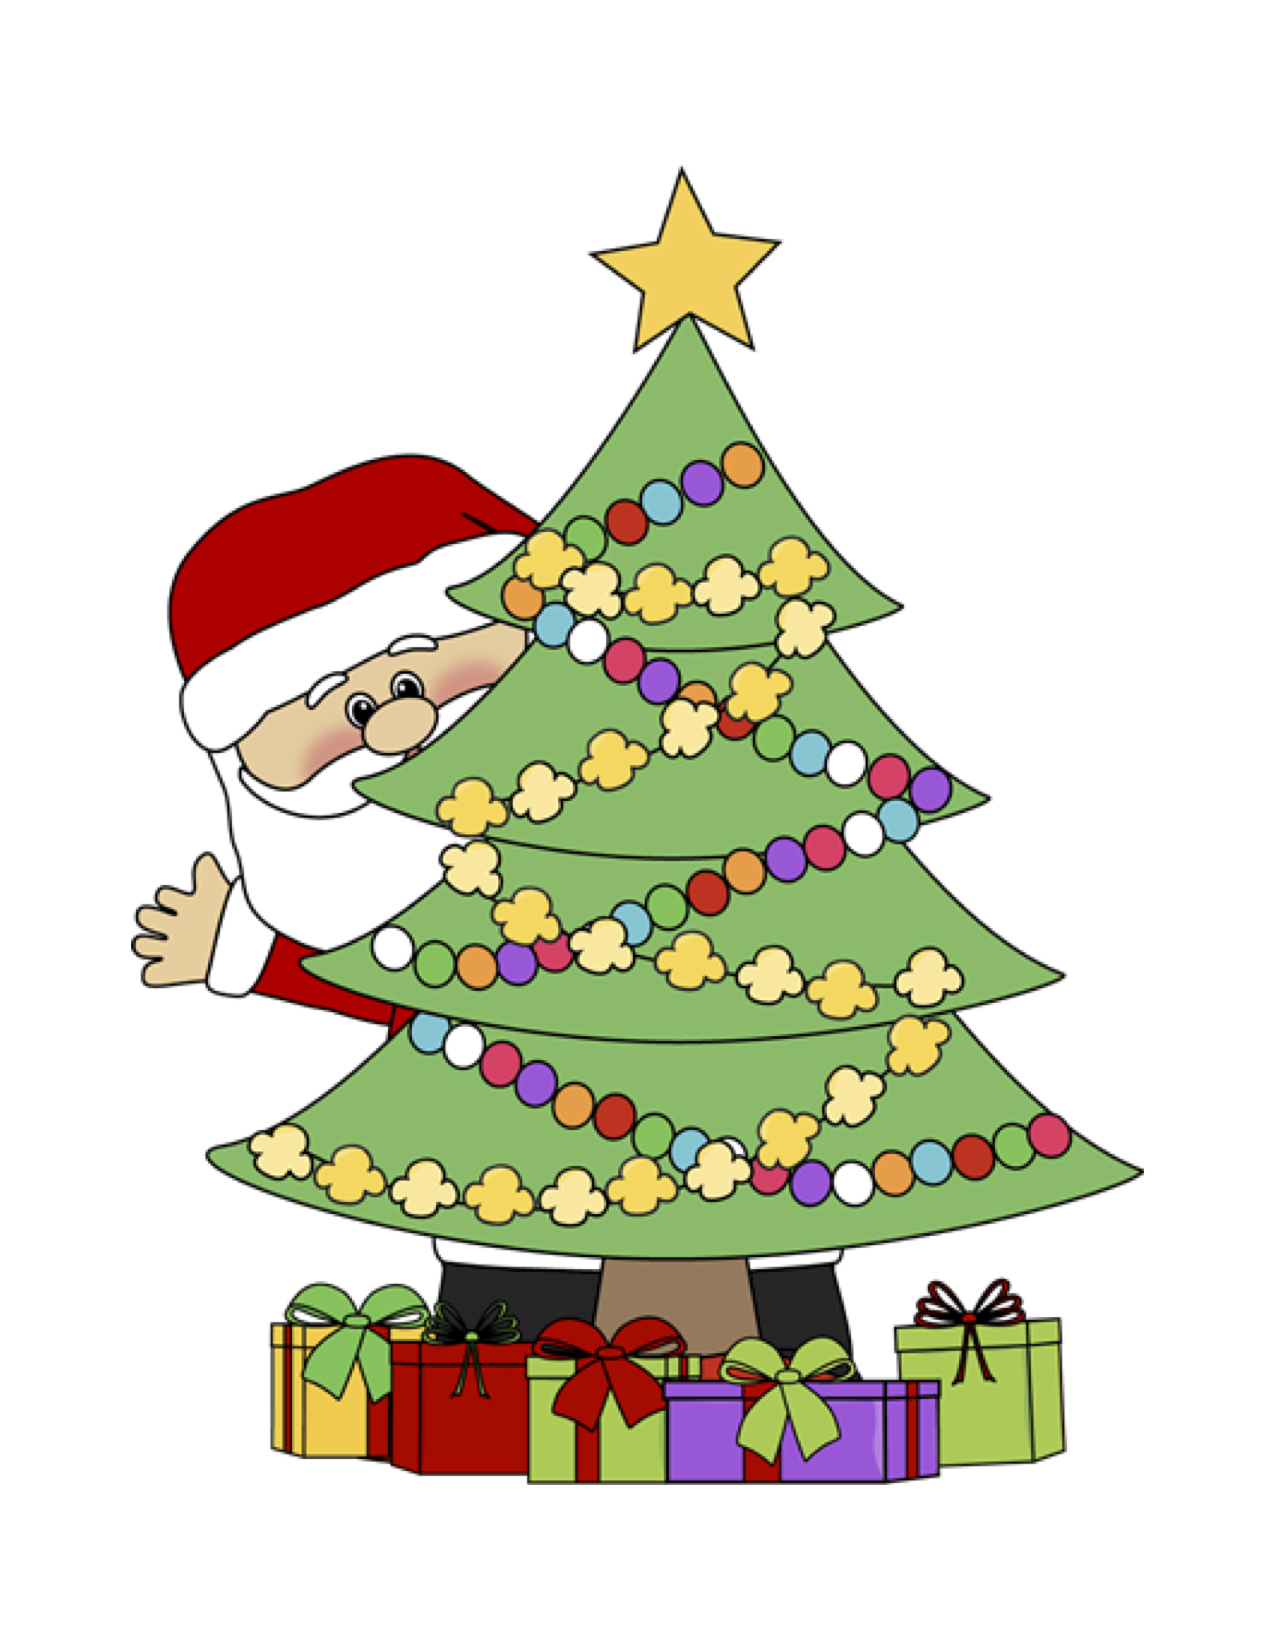 Winter Solstice Christmas Tree Run.